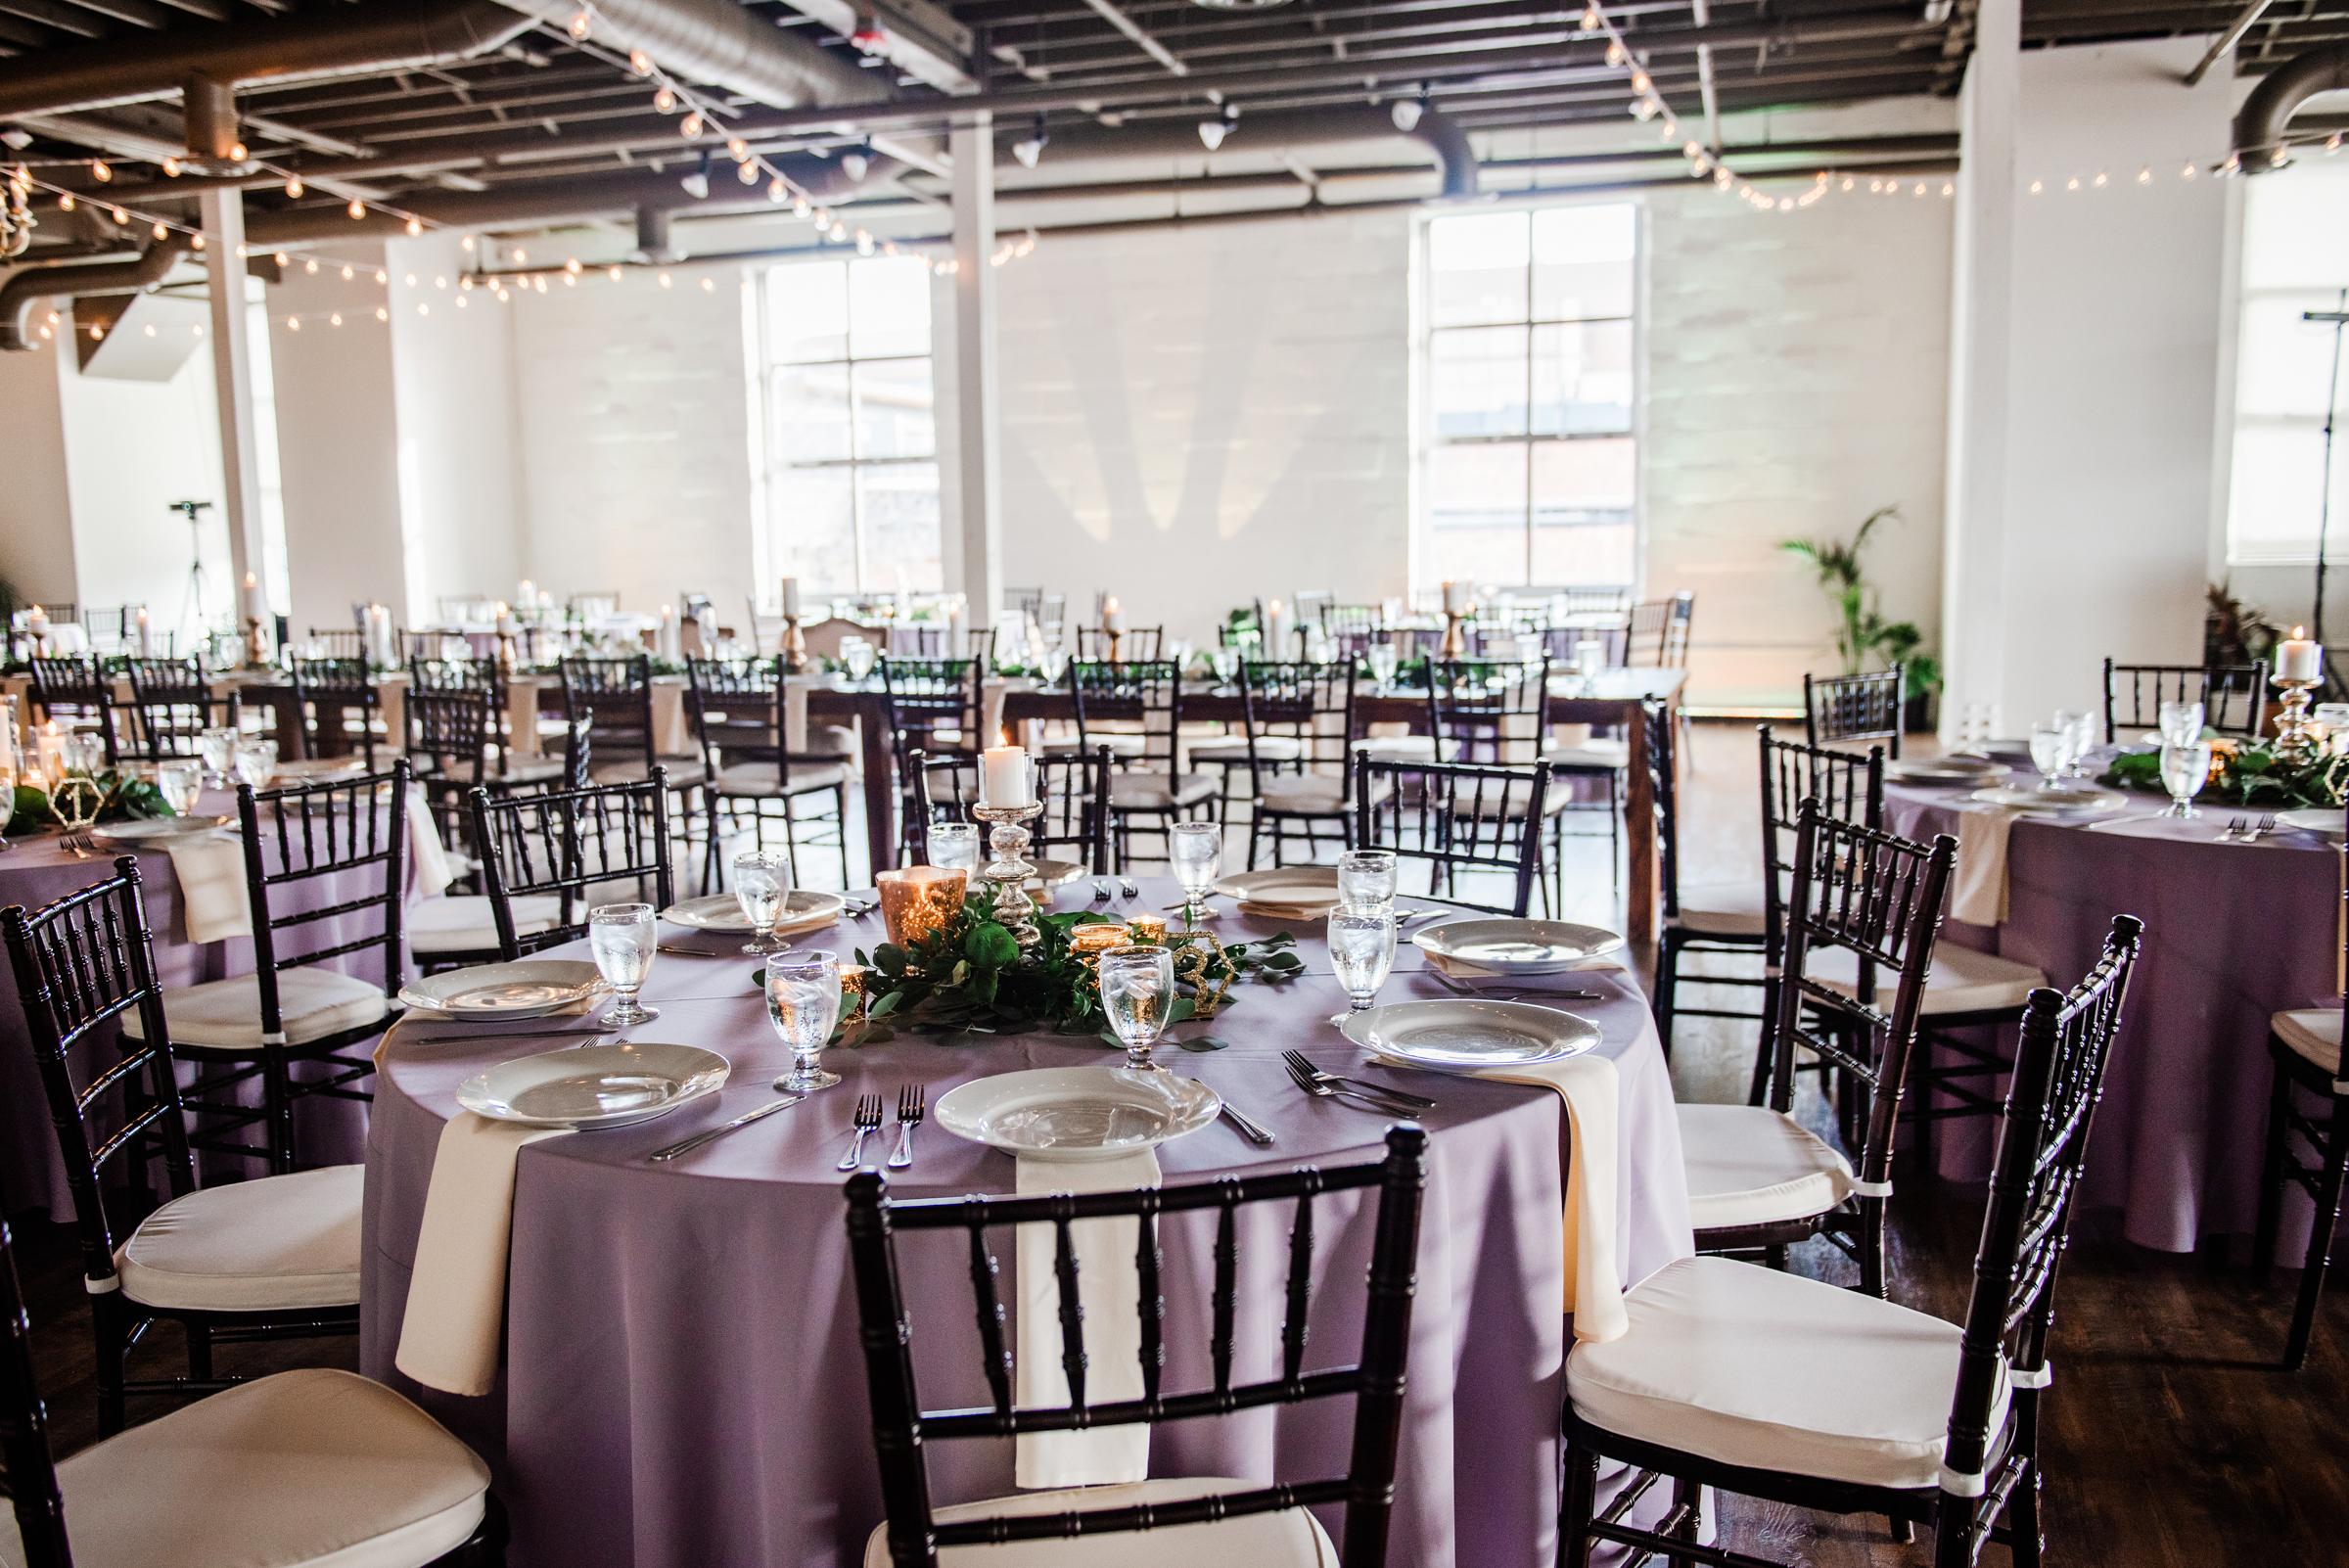 The_Arbor_LoftRochester_Wedding_JILL_STUDIO_Rochester_NY_Photographer_174105.jpg